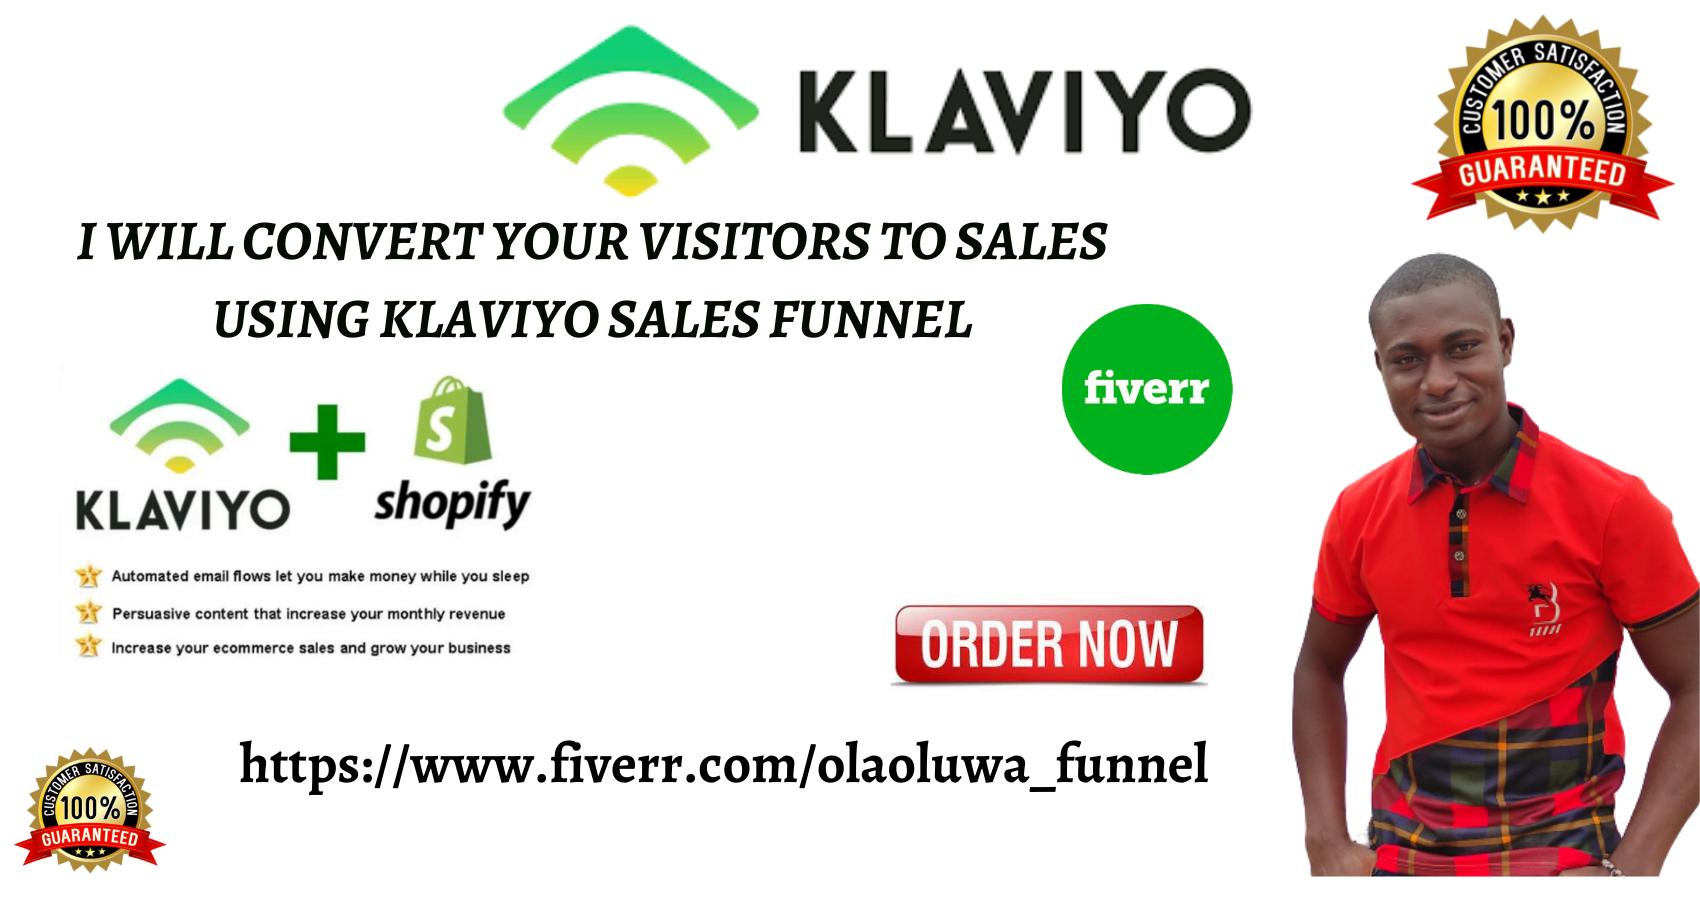 I will set up klaviyo sales funnel,klaviyo marketing,shopify sales funnel in klaviyo olaoluwa_funnel olaoluwa_funnel, FiverrBox